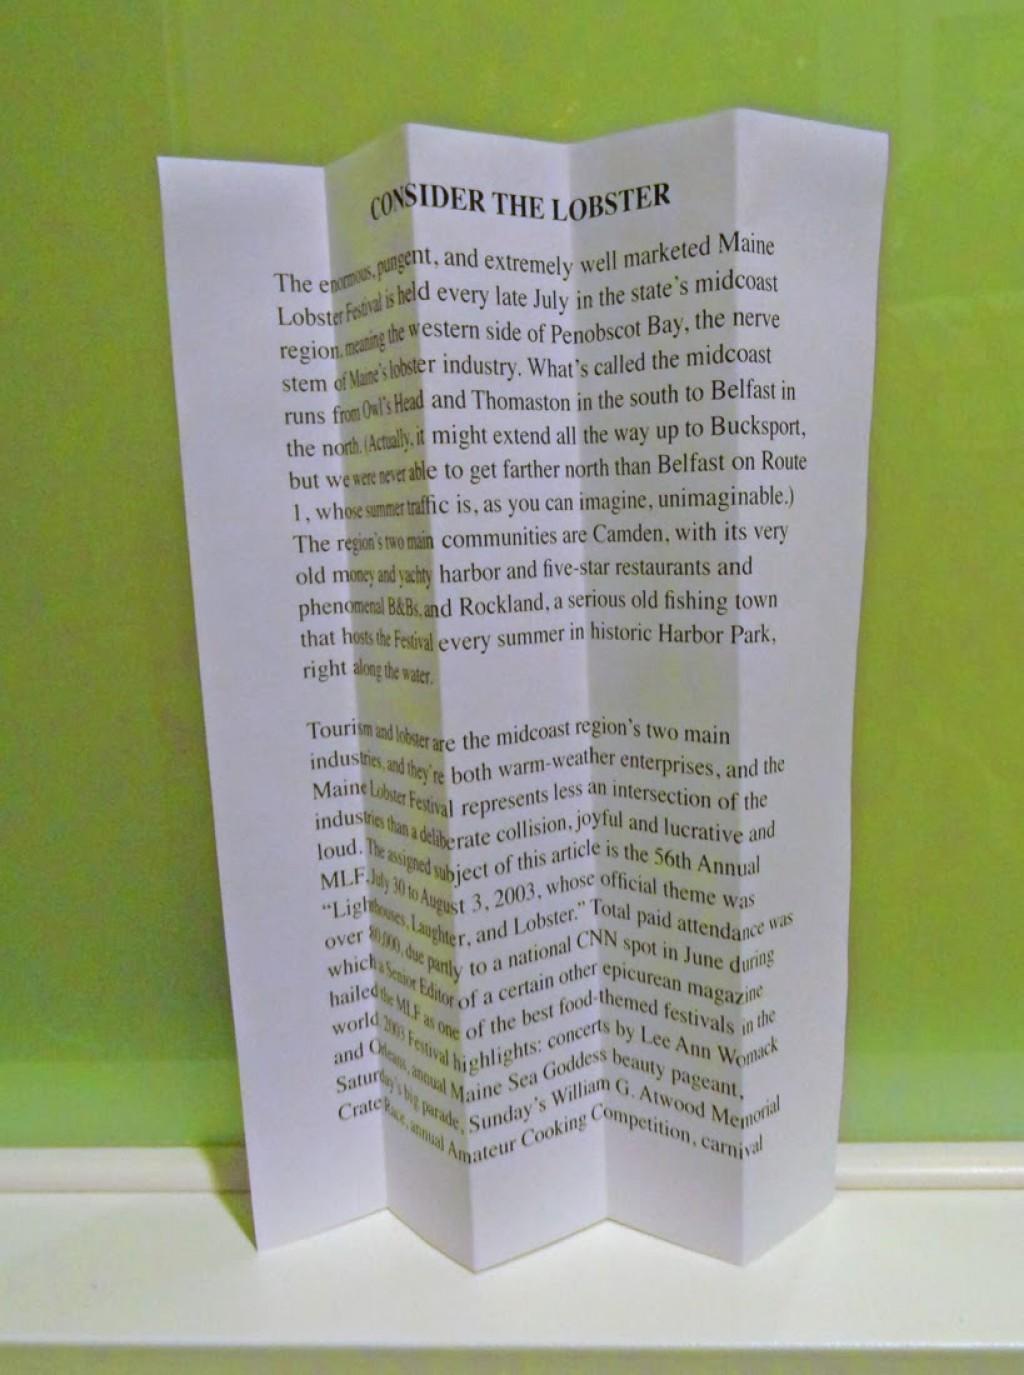 008 Essay Example Jpg Public Stunning Speaking Topics Introduction Large